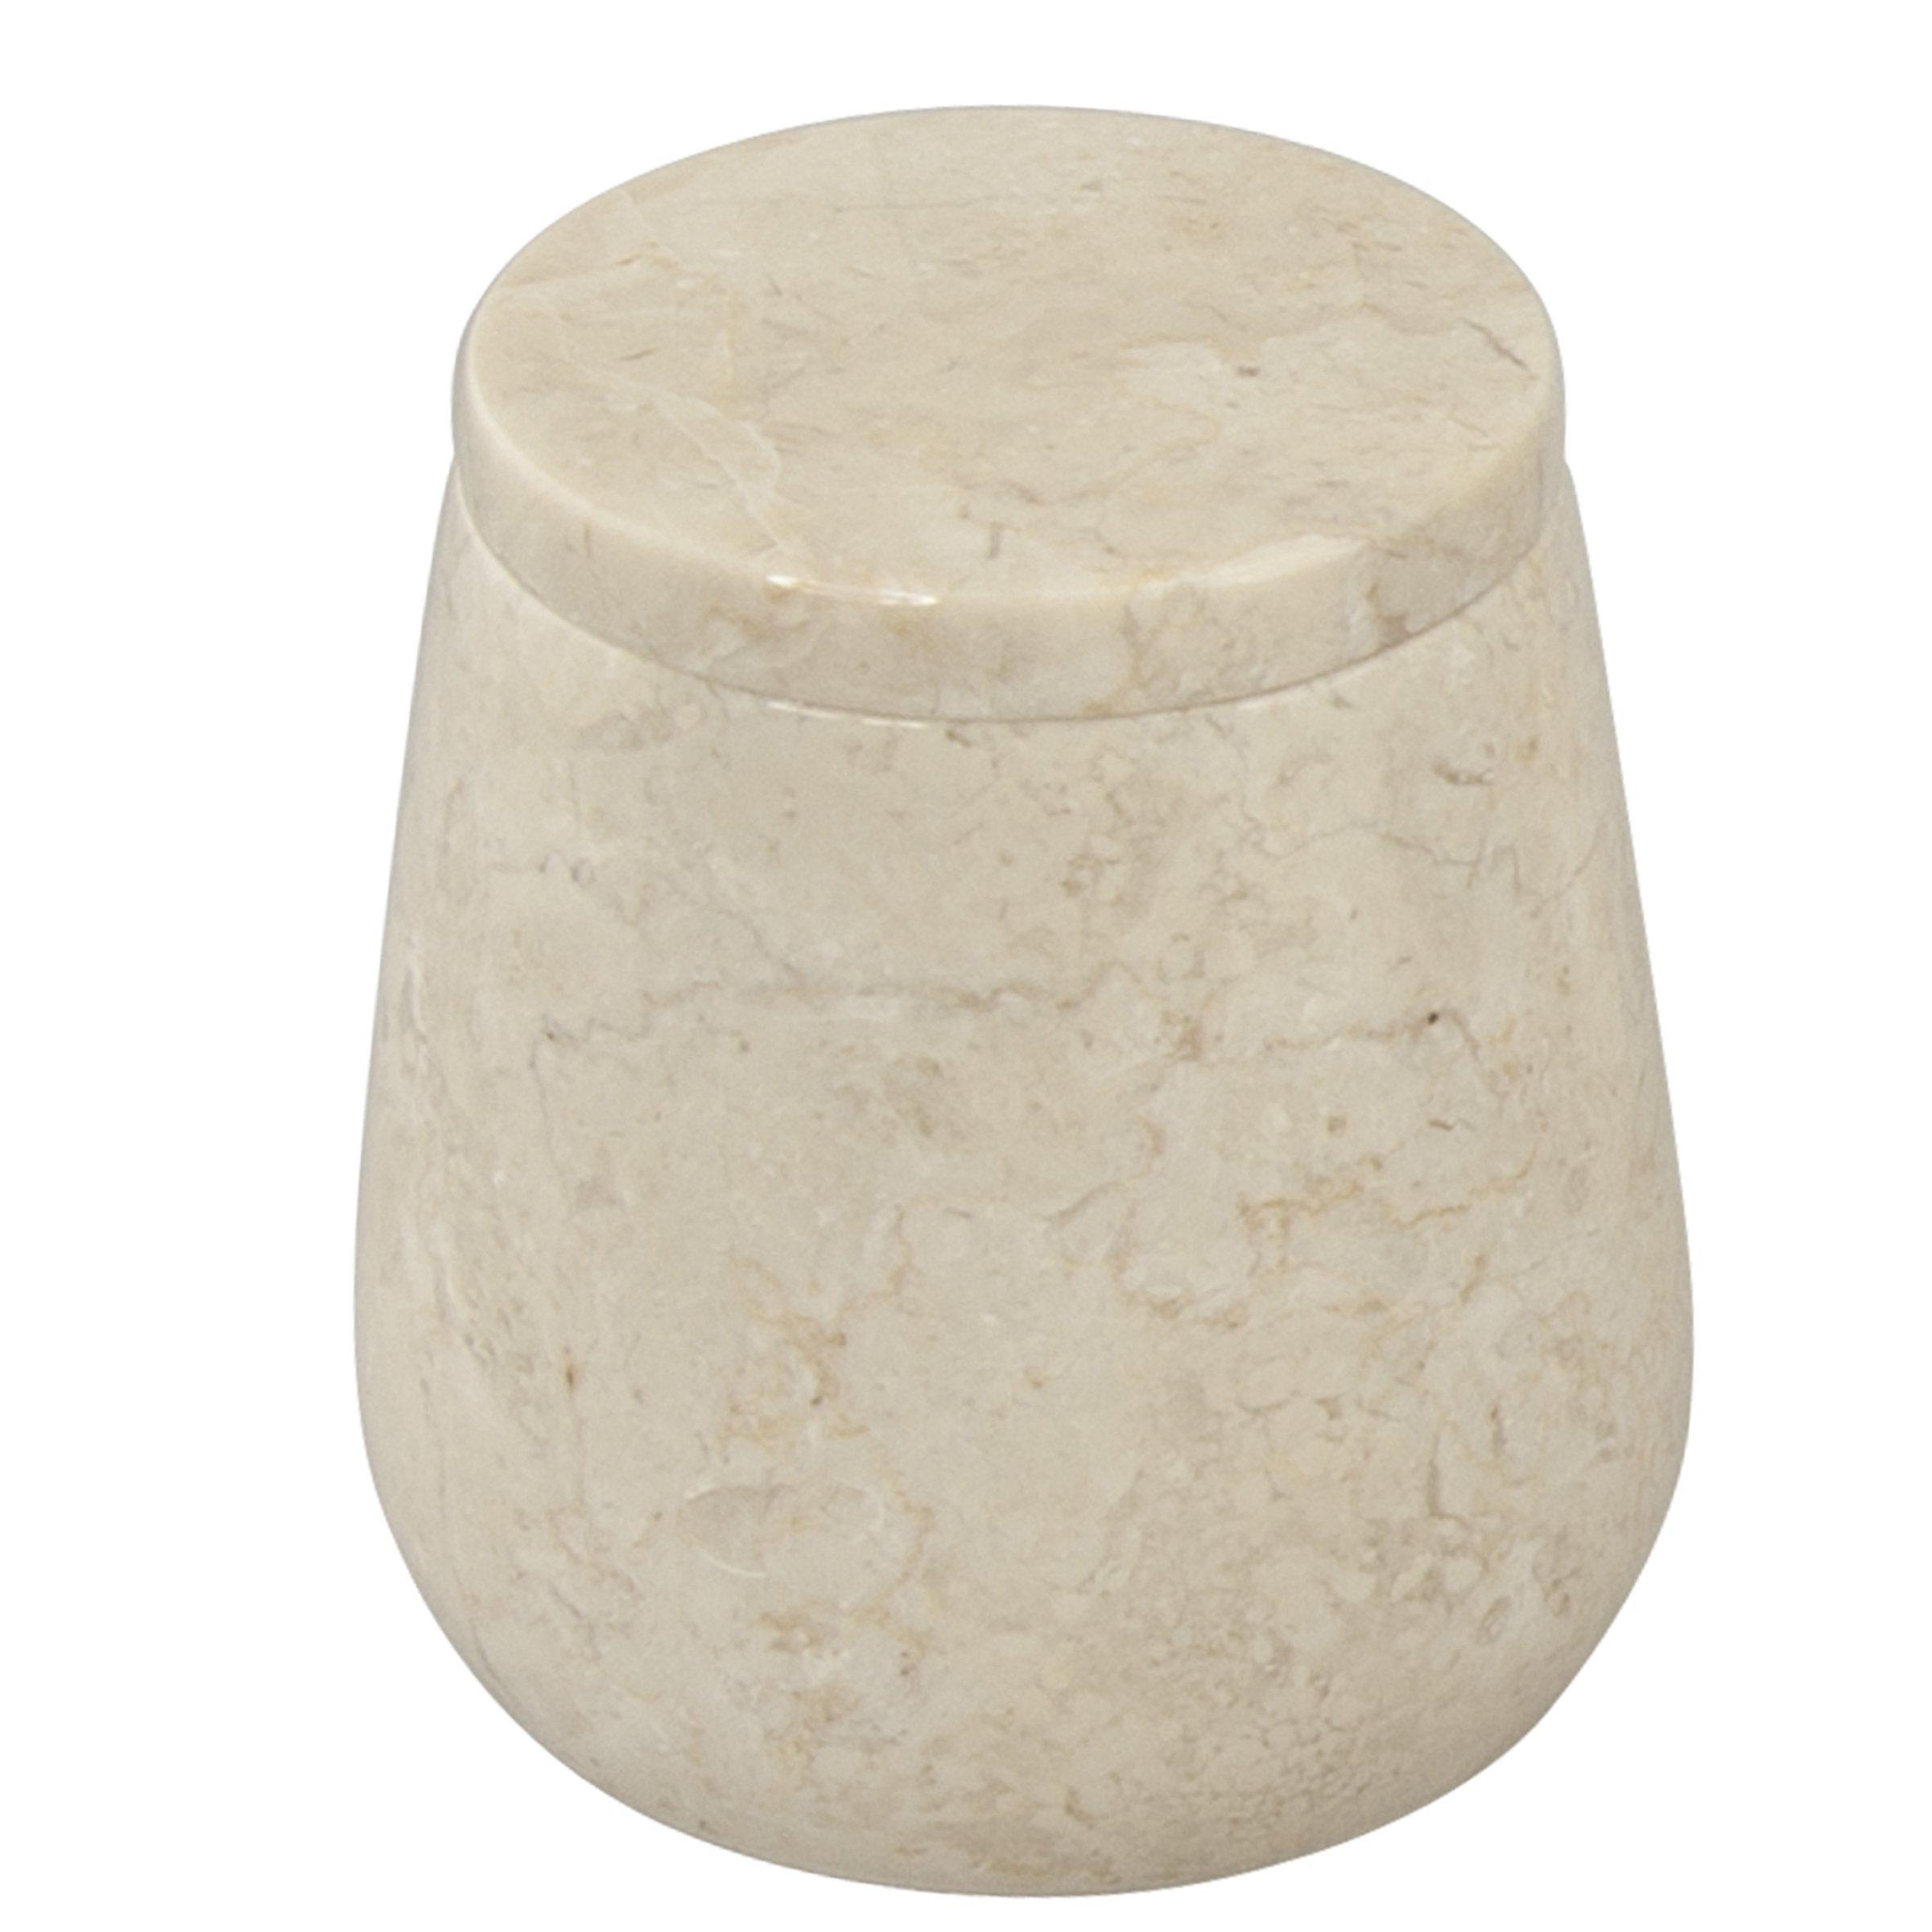 Creative Home 33032 Genuine Champagne Marble Stone Cotton Ball Holder,